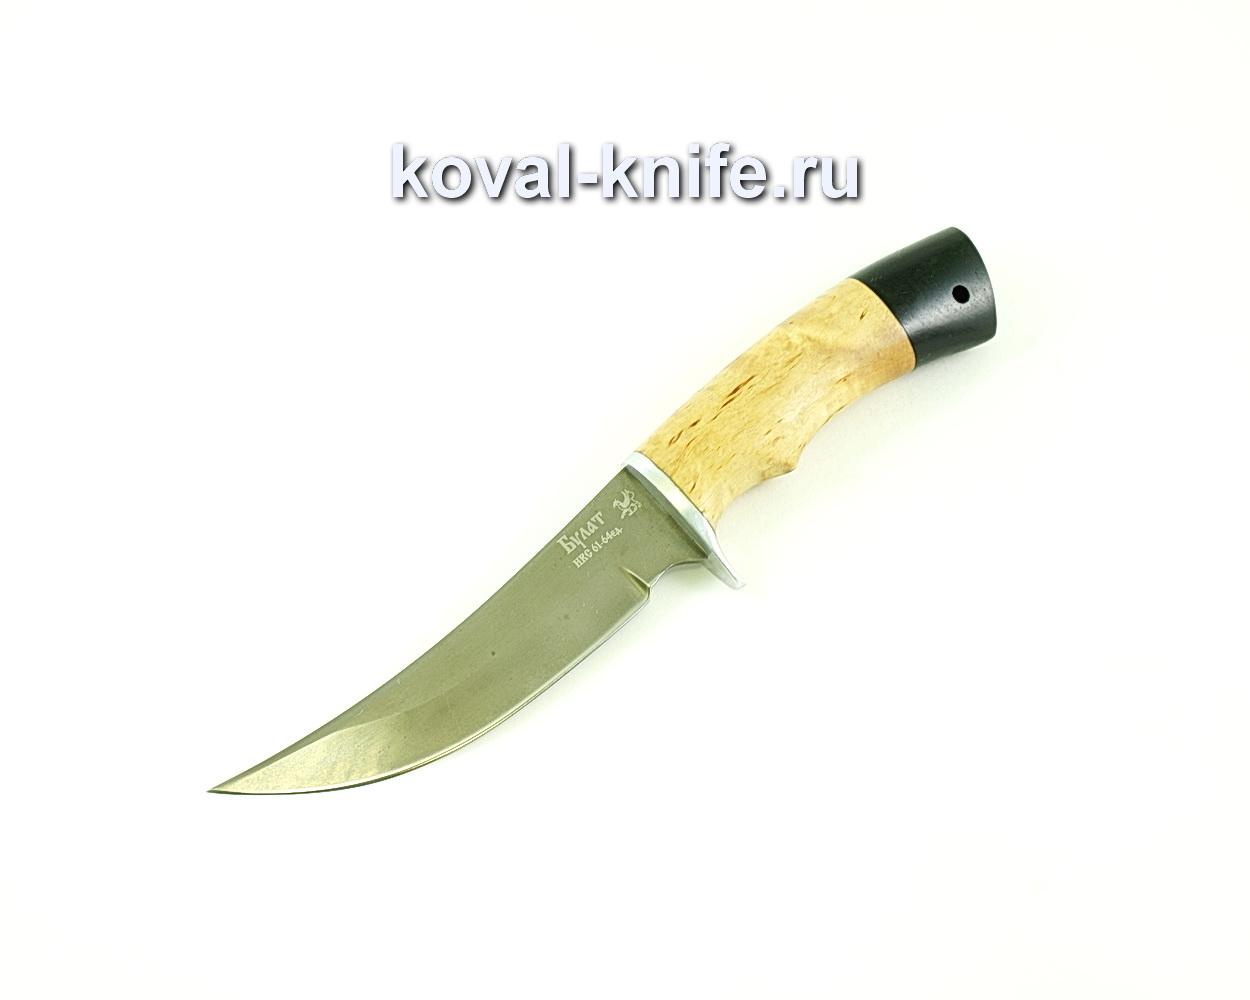 Нож Ворон (сталь Булат), рукоять карелка, граб